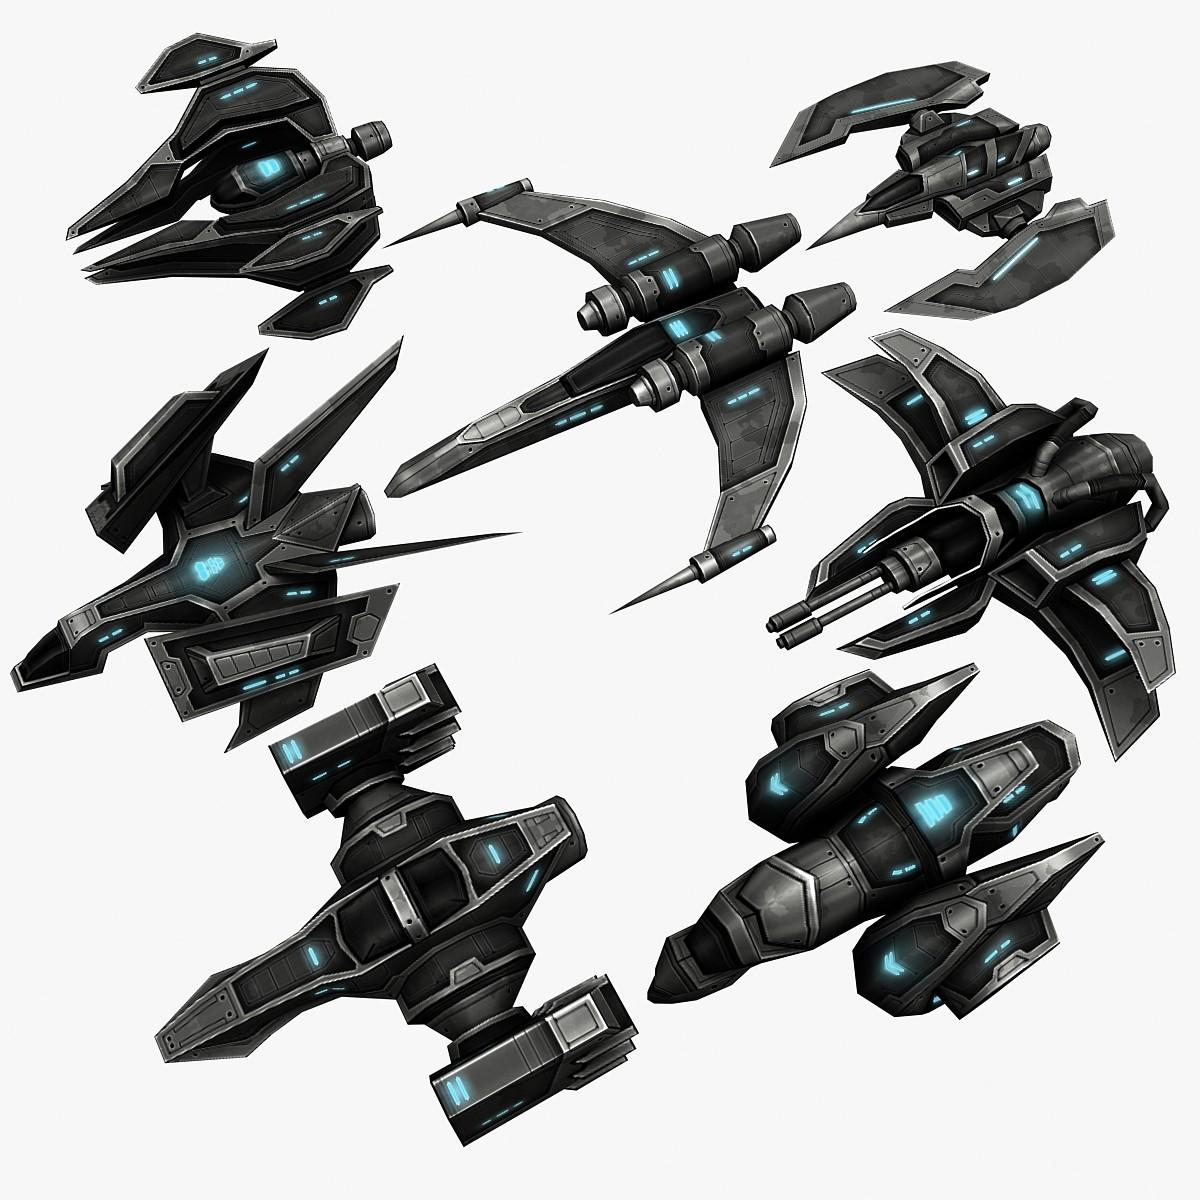 7_ships_preview_0.jpg